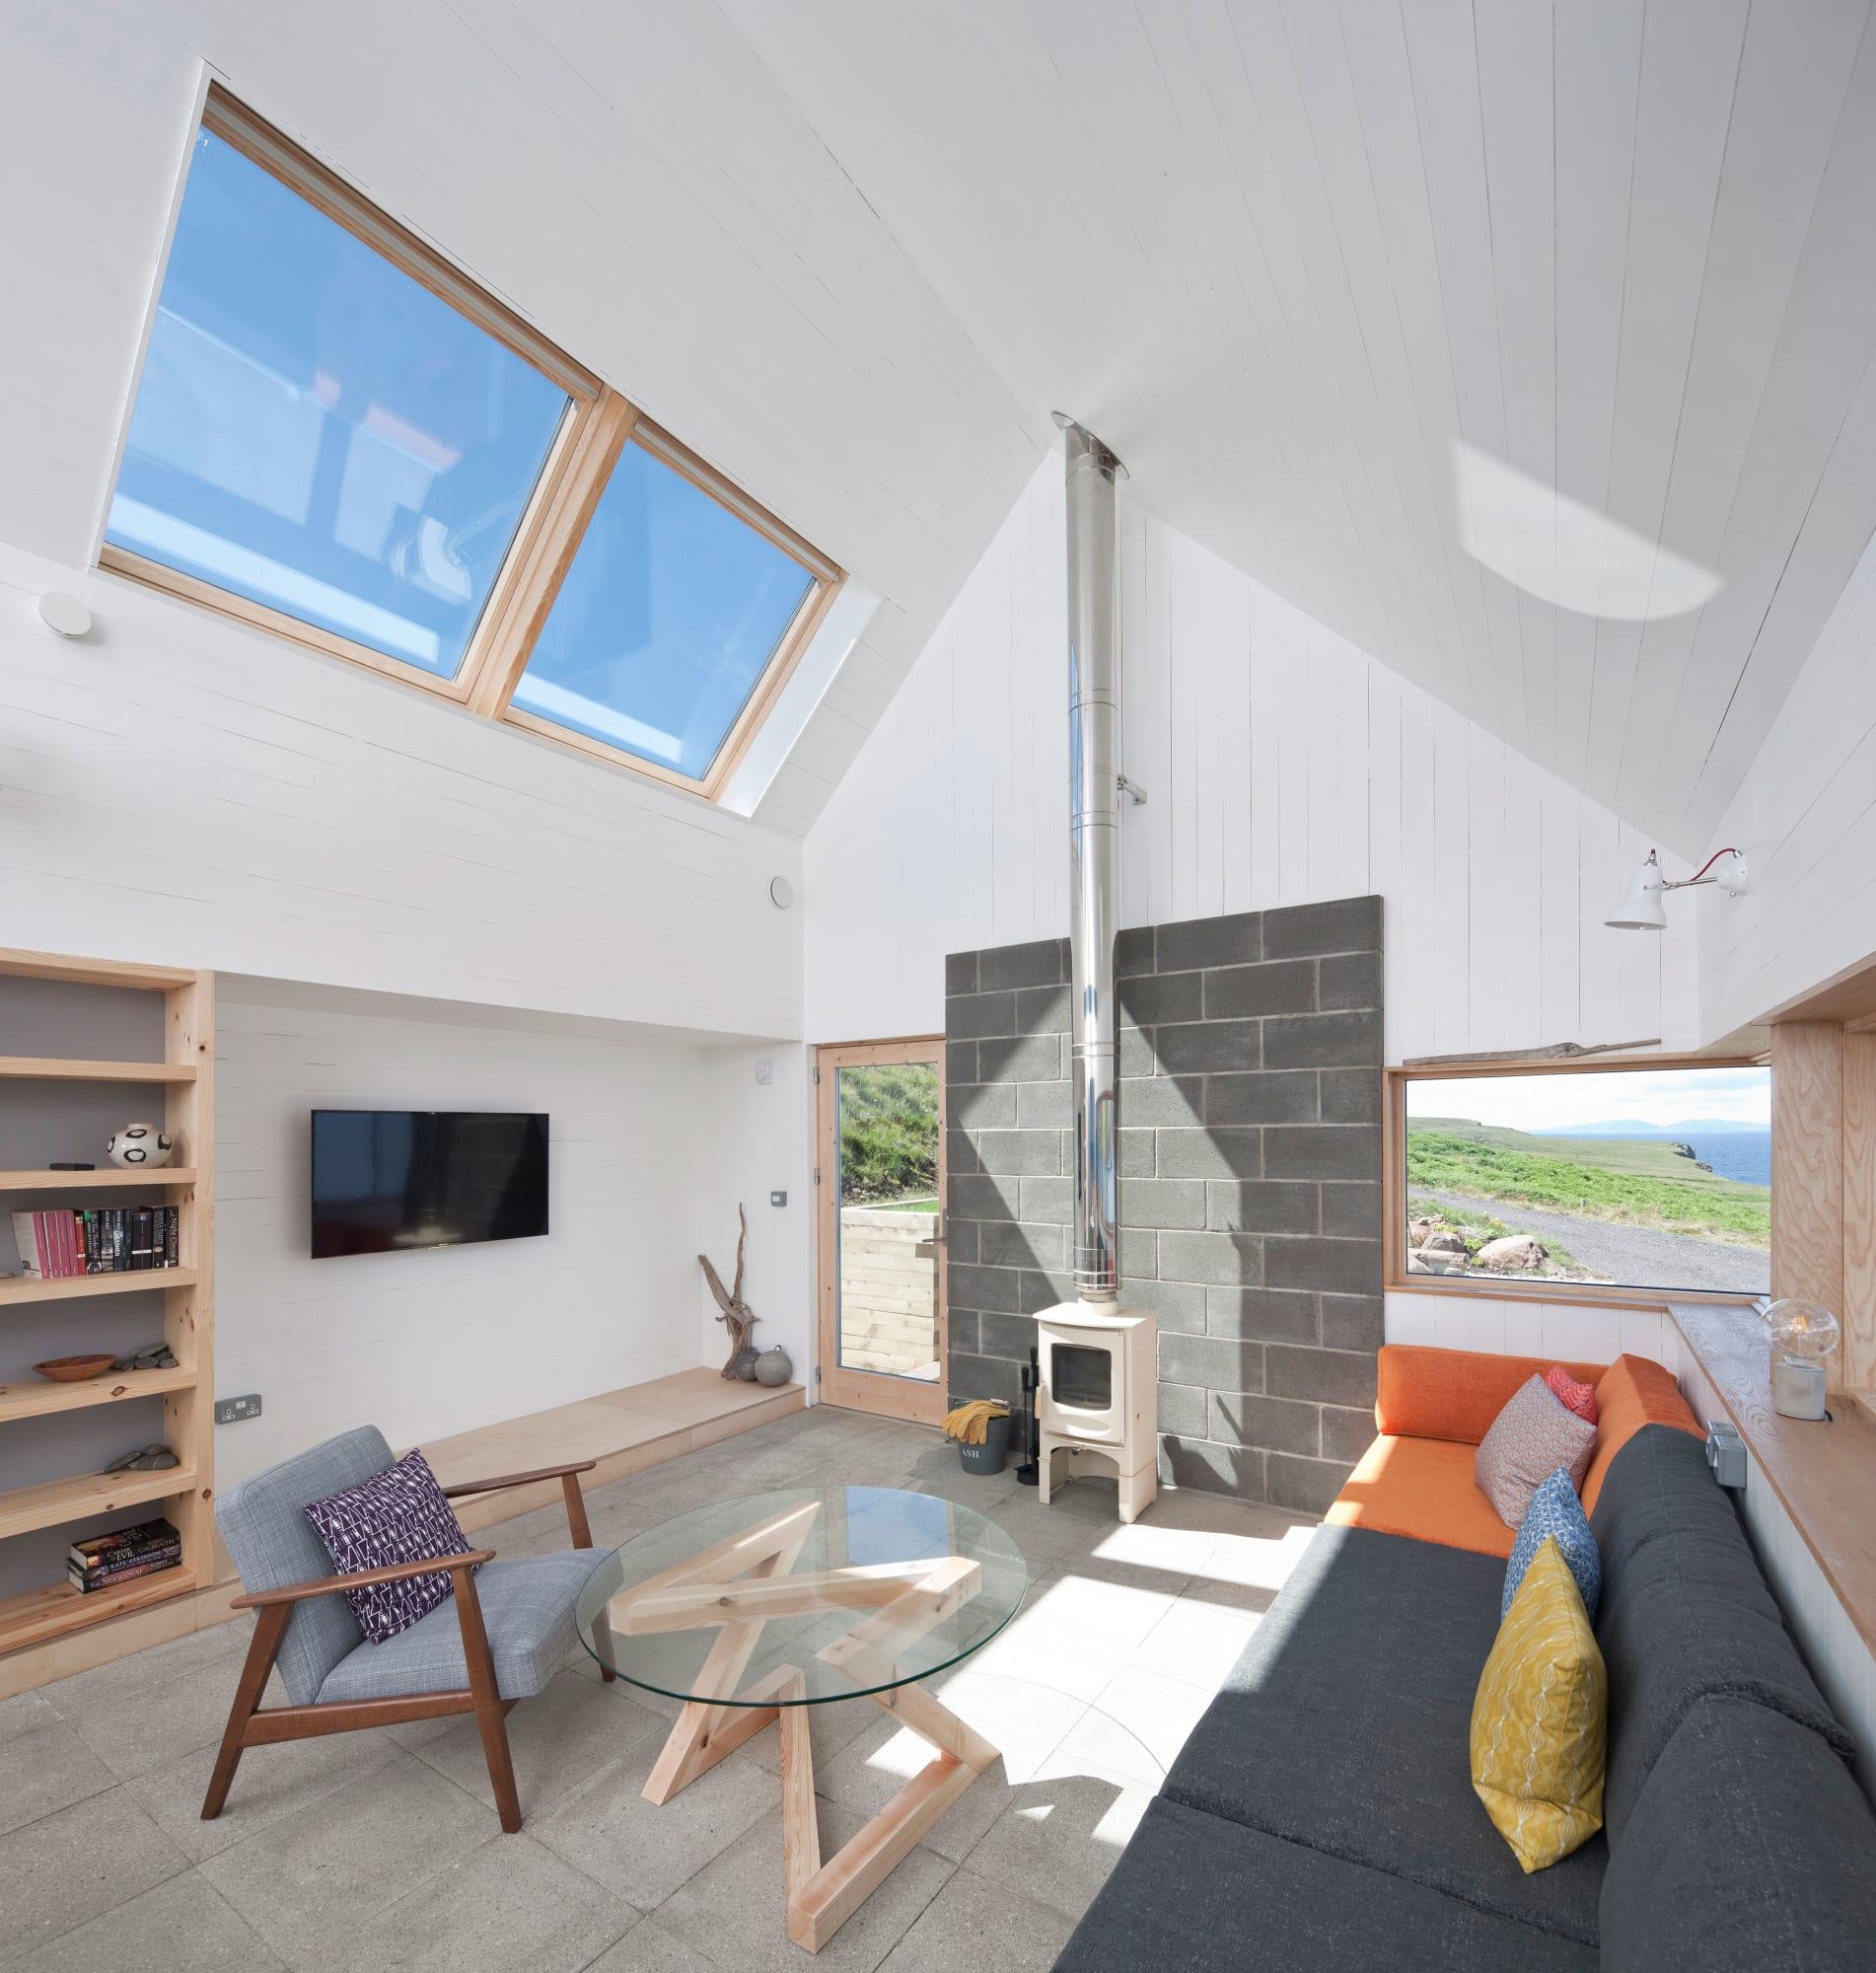 Rural Design David Barbour Tinhouse Divisare